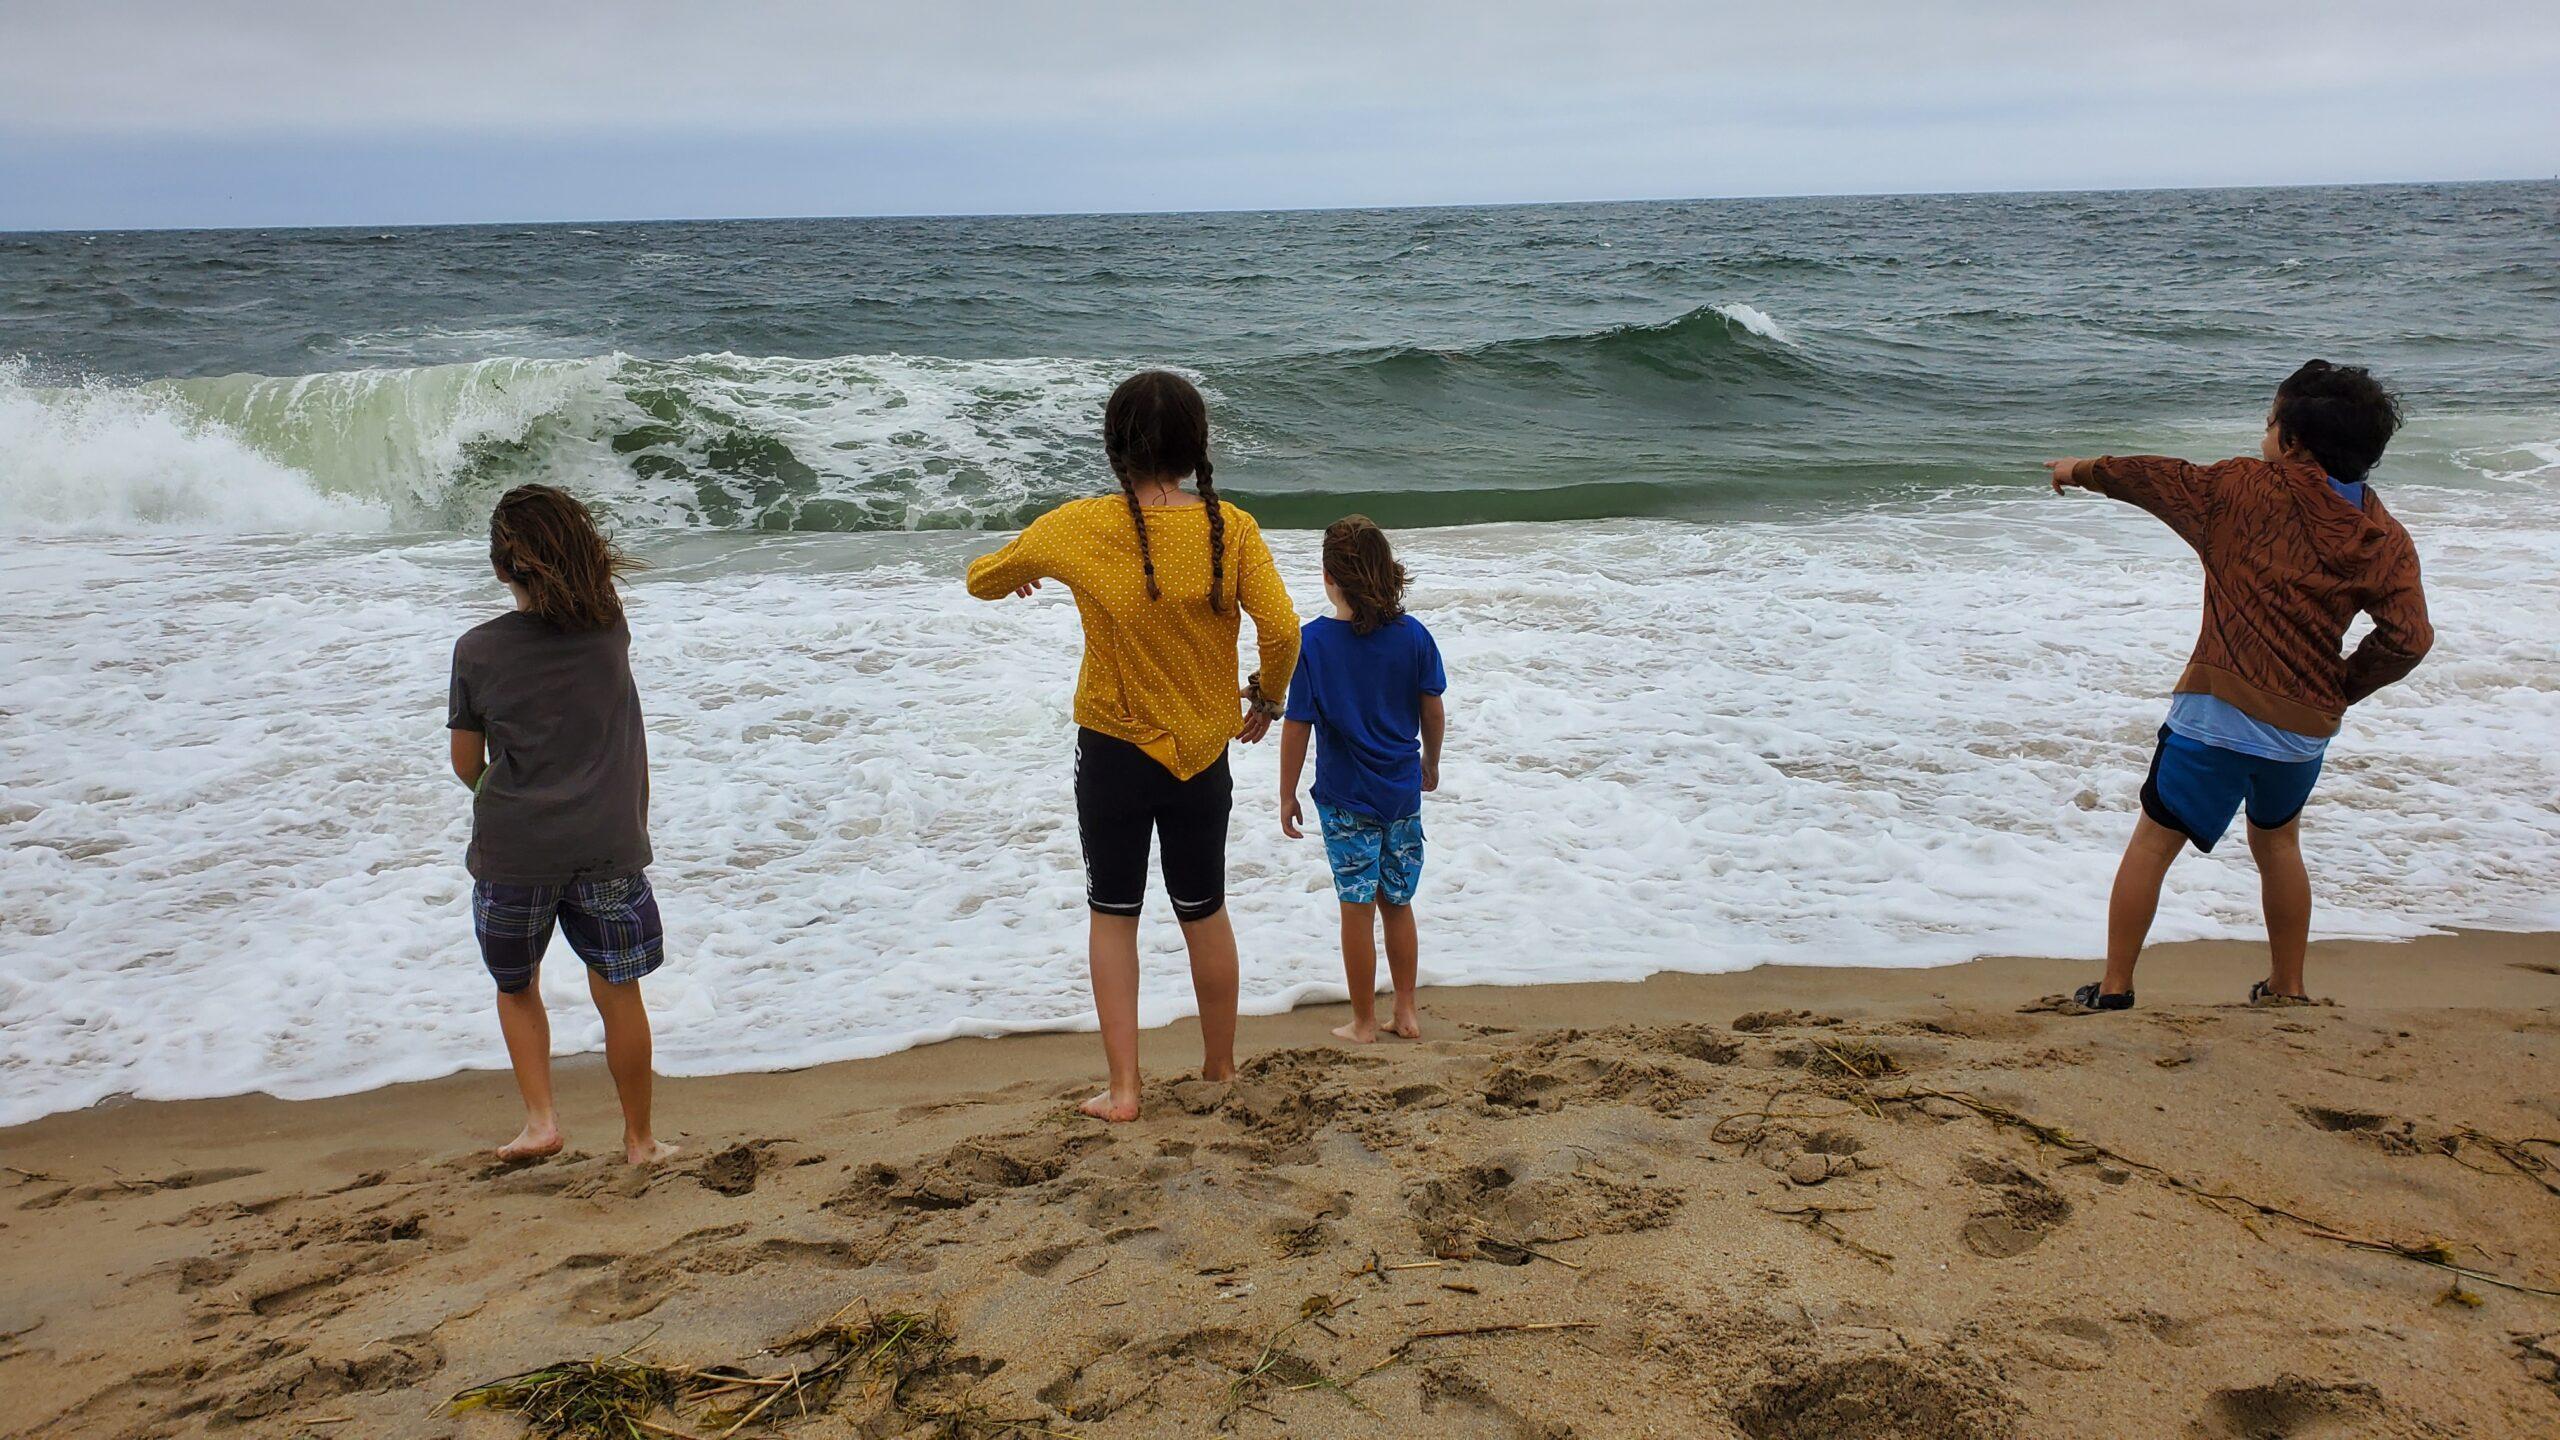 Pandemic Field Trip to Salisbury Beach